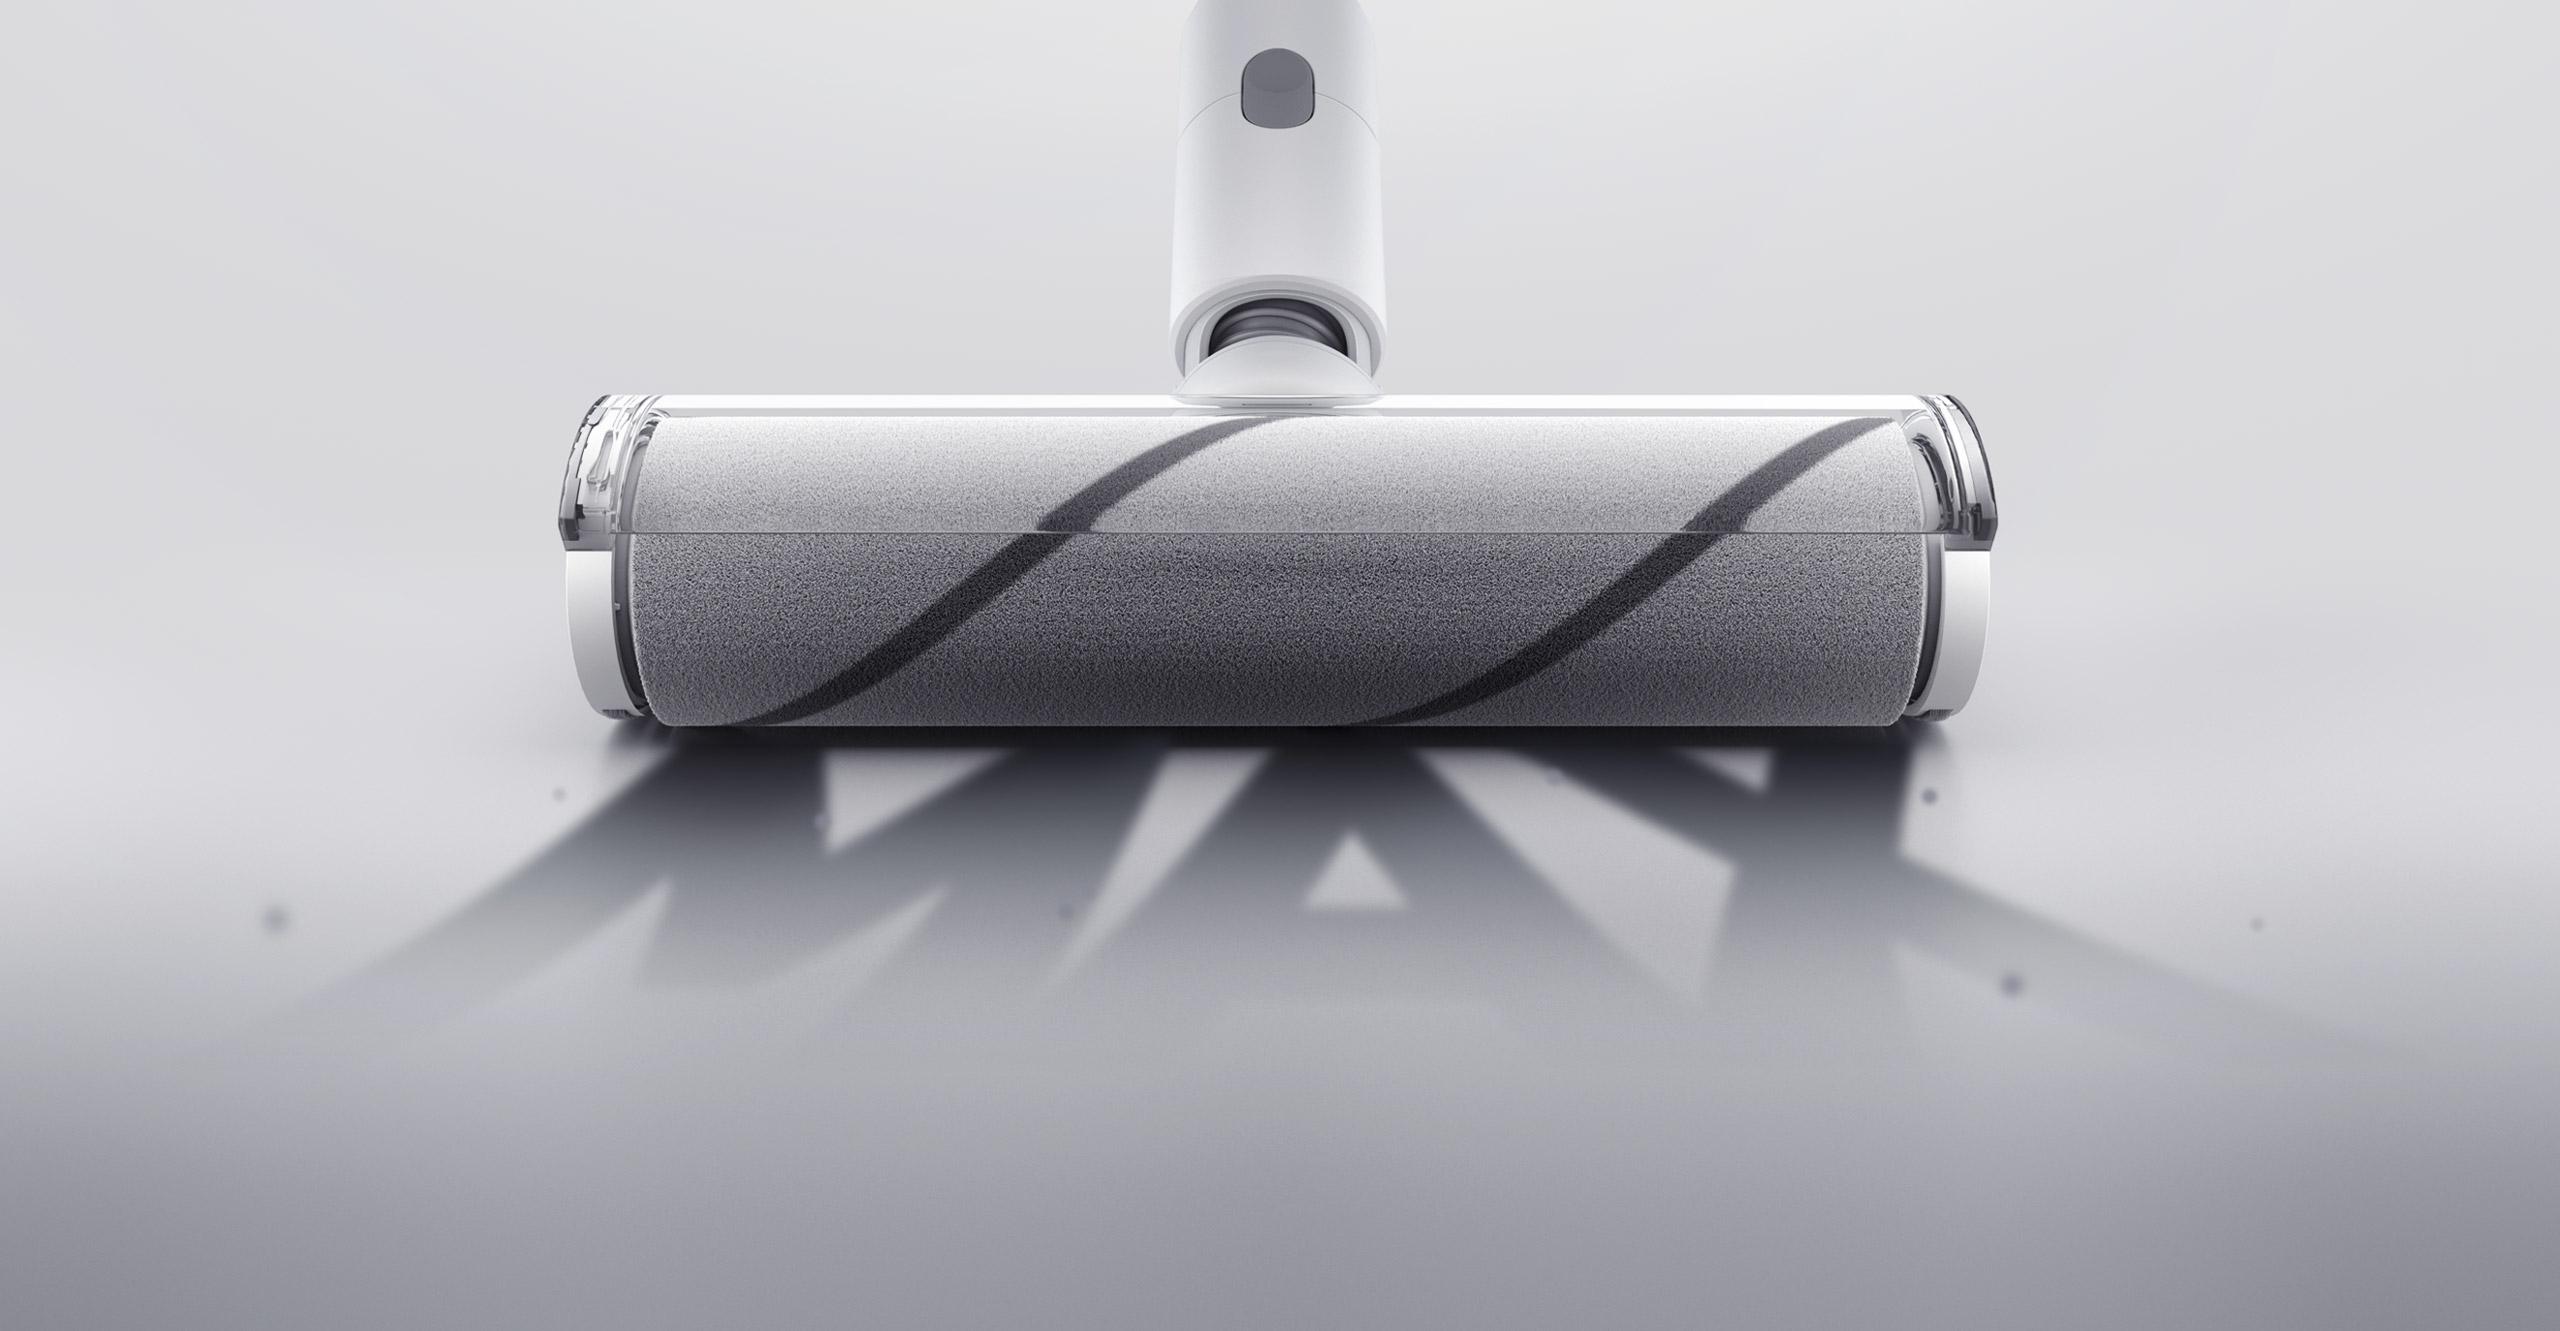 Xiaomi Mi Handheld Vacuum Cleaner hlavní kartáč